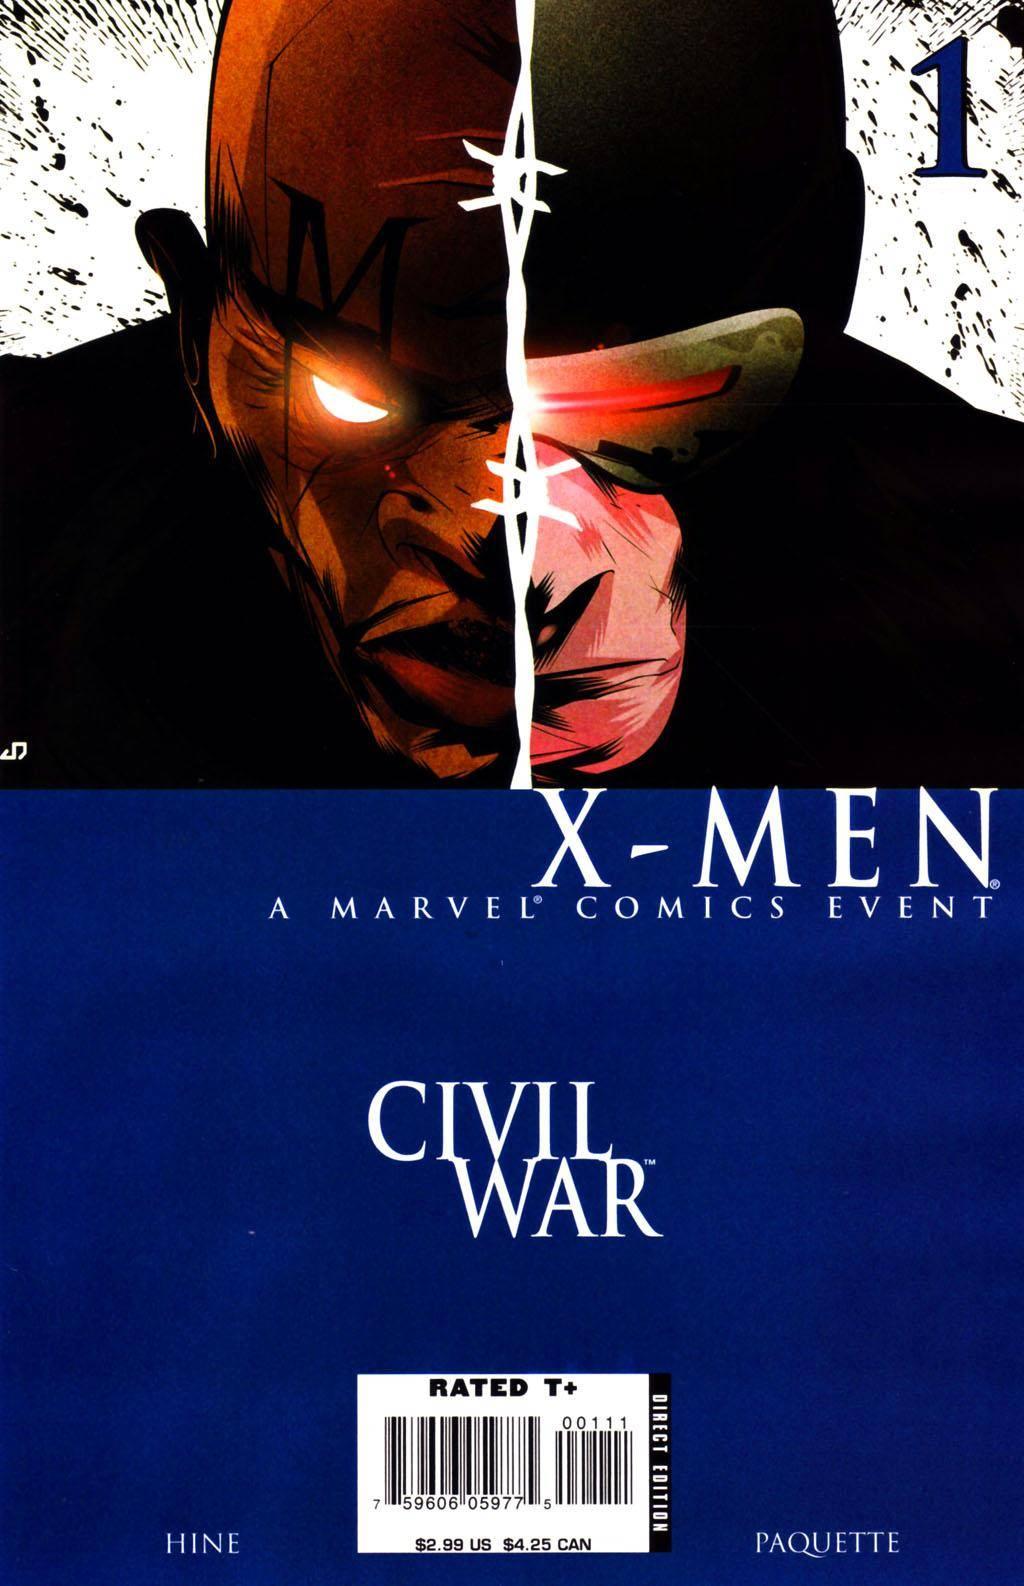 Civil War - X-Men 01